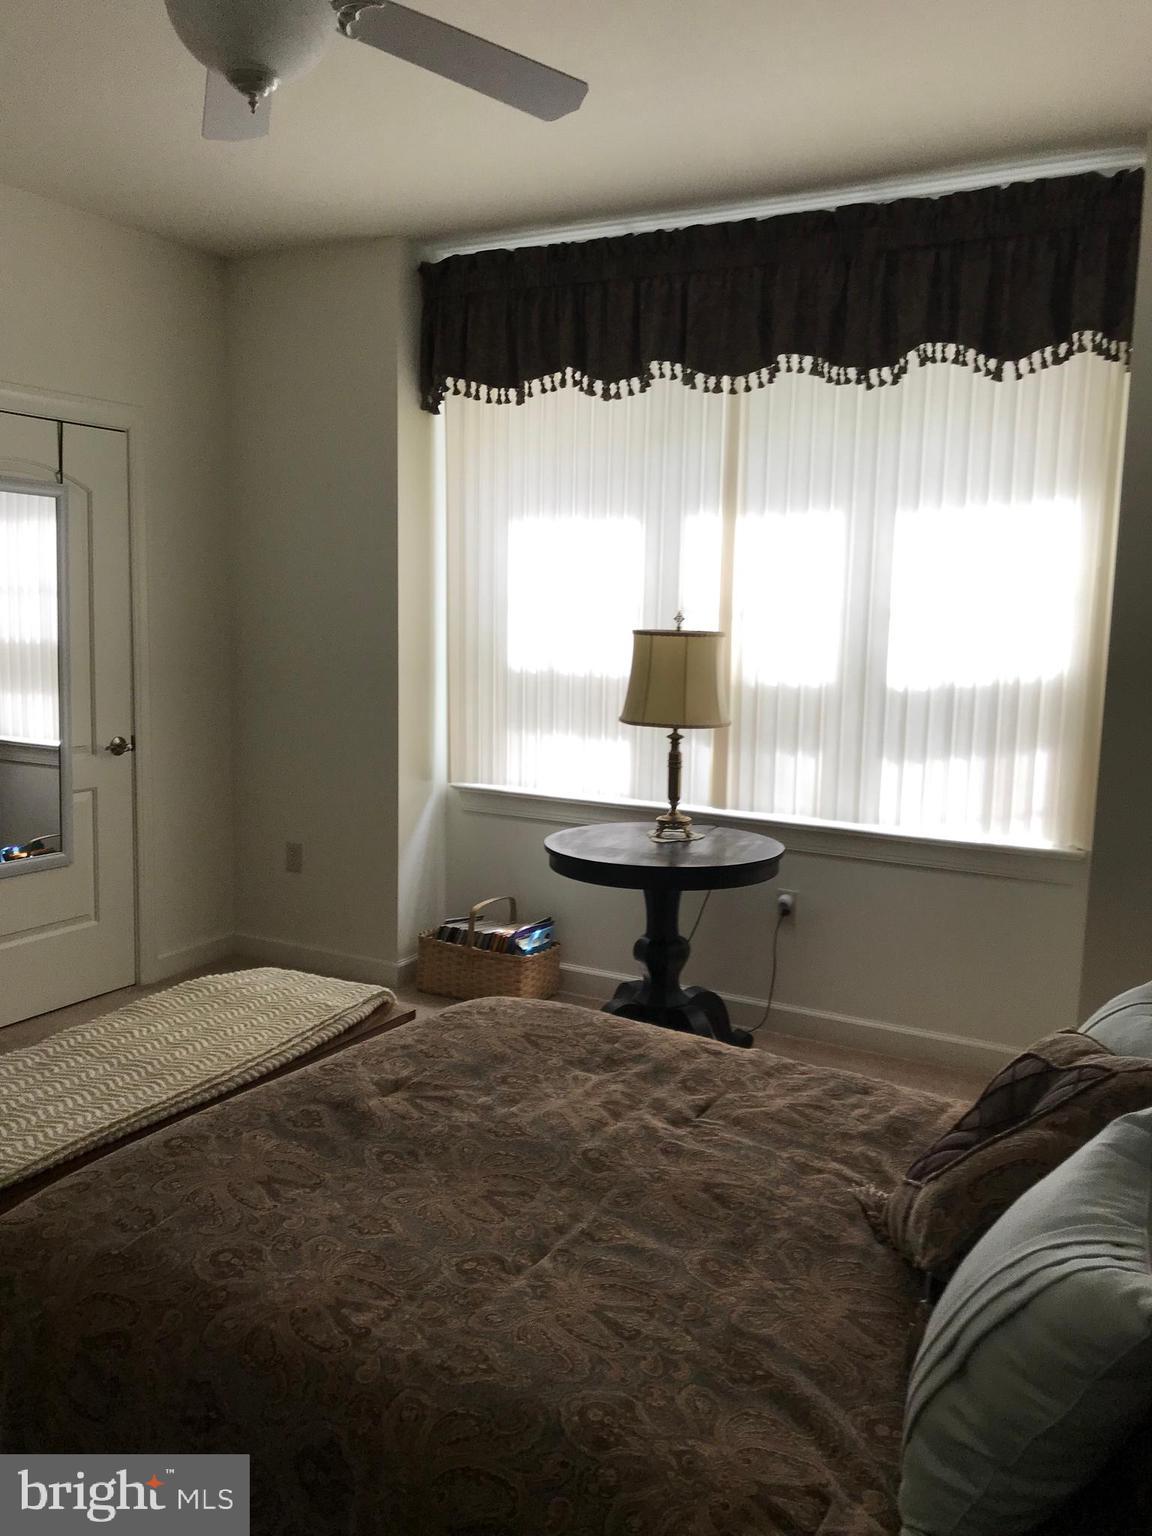 Master Bedroom has a triple window overlooking the